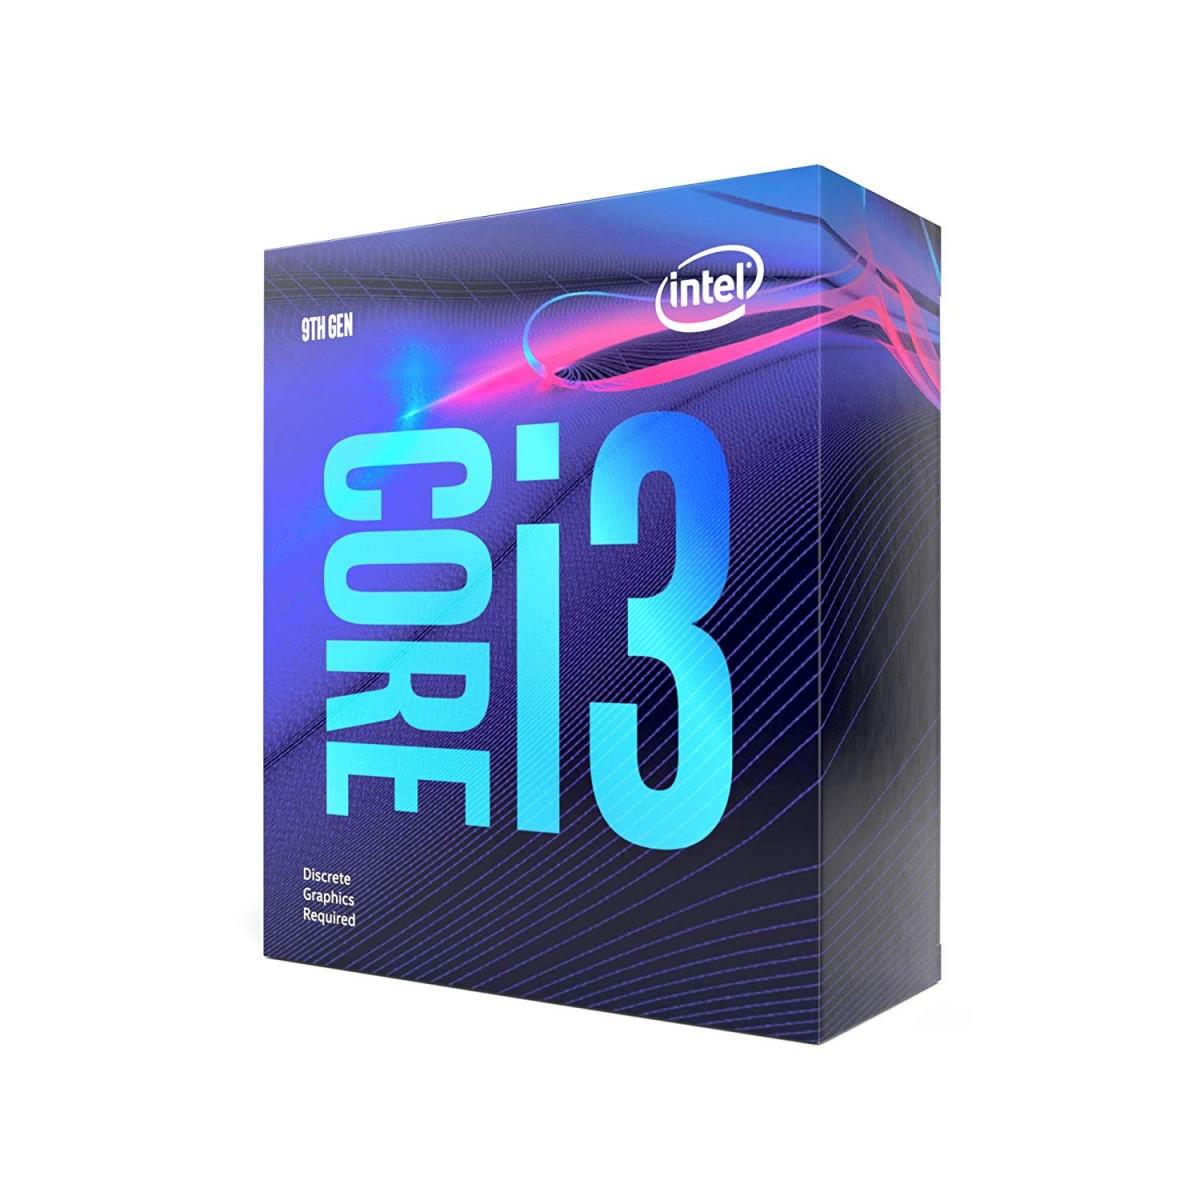 Intel Core i3 9100F Processor 9th Gen